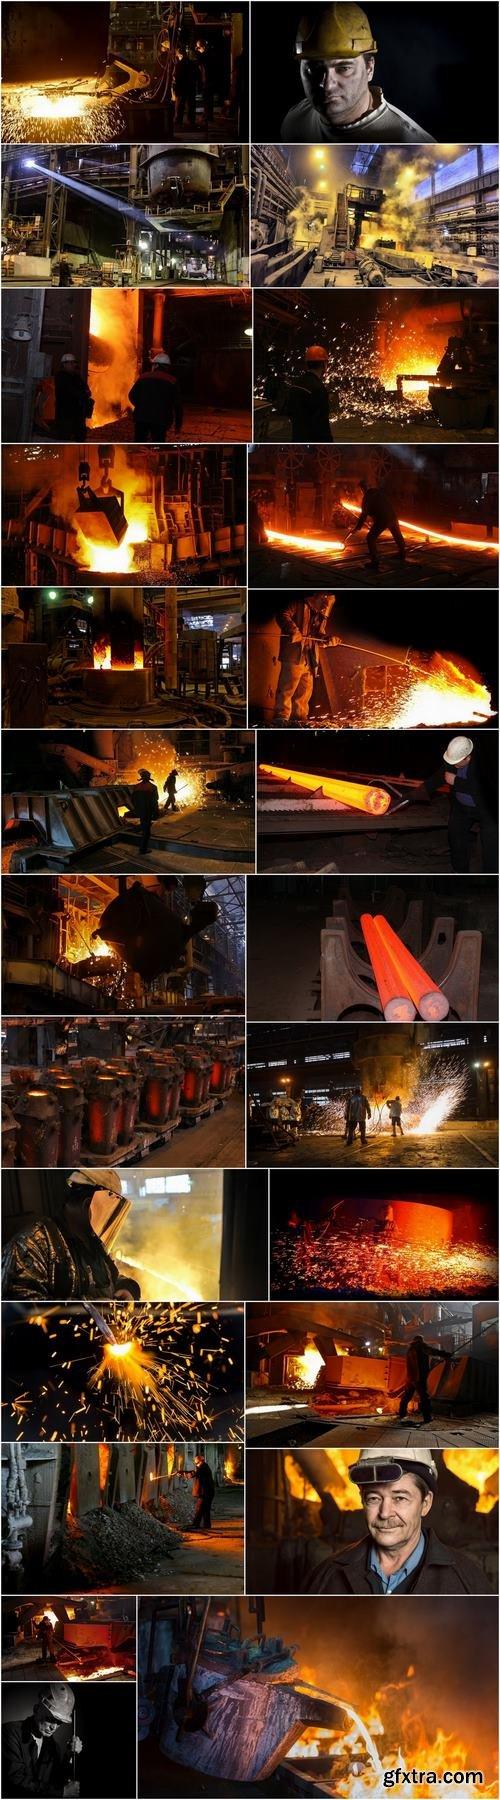 Steelmaker metallurgical blast furnace melting metal factory factory worker 25 HQ Jpeg